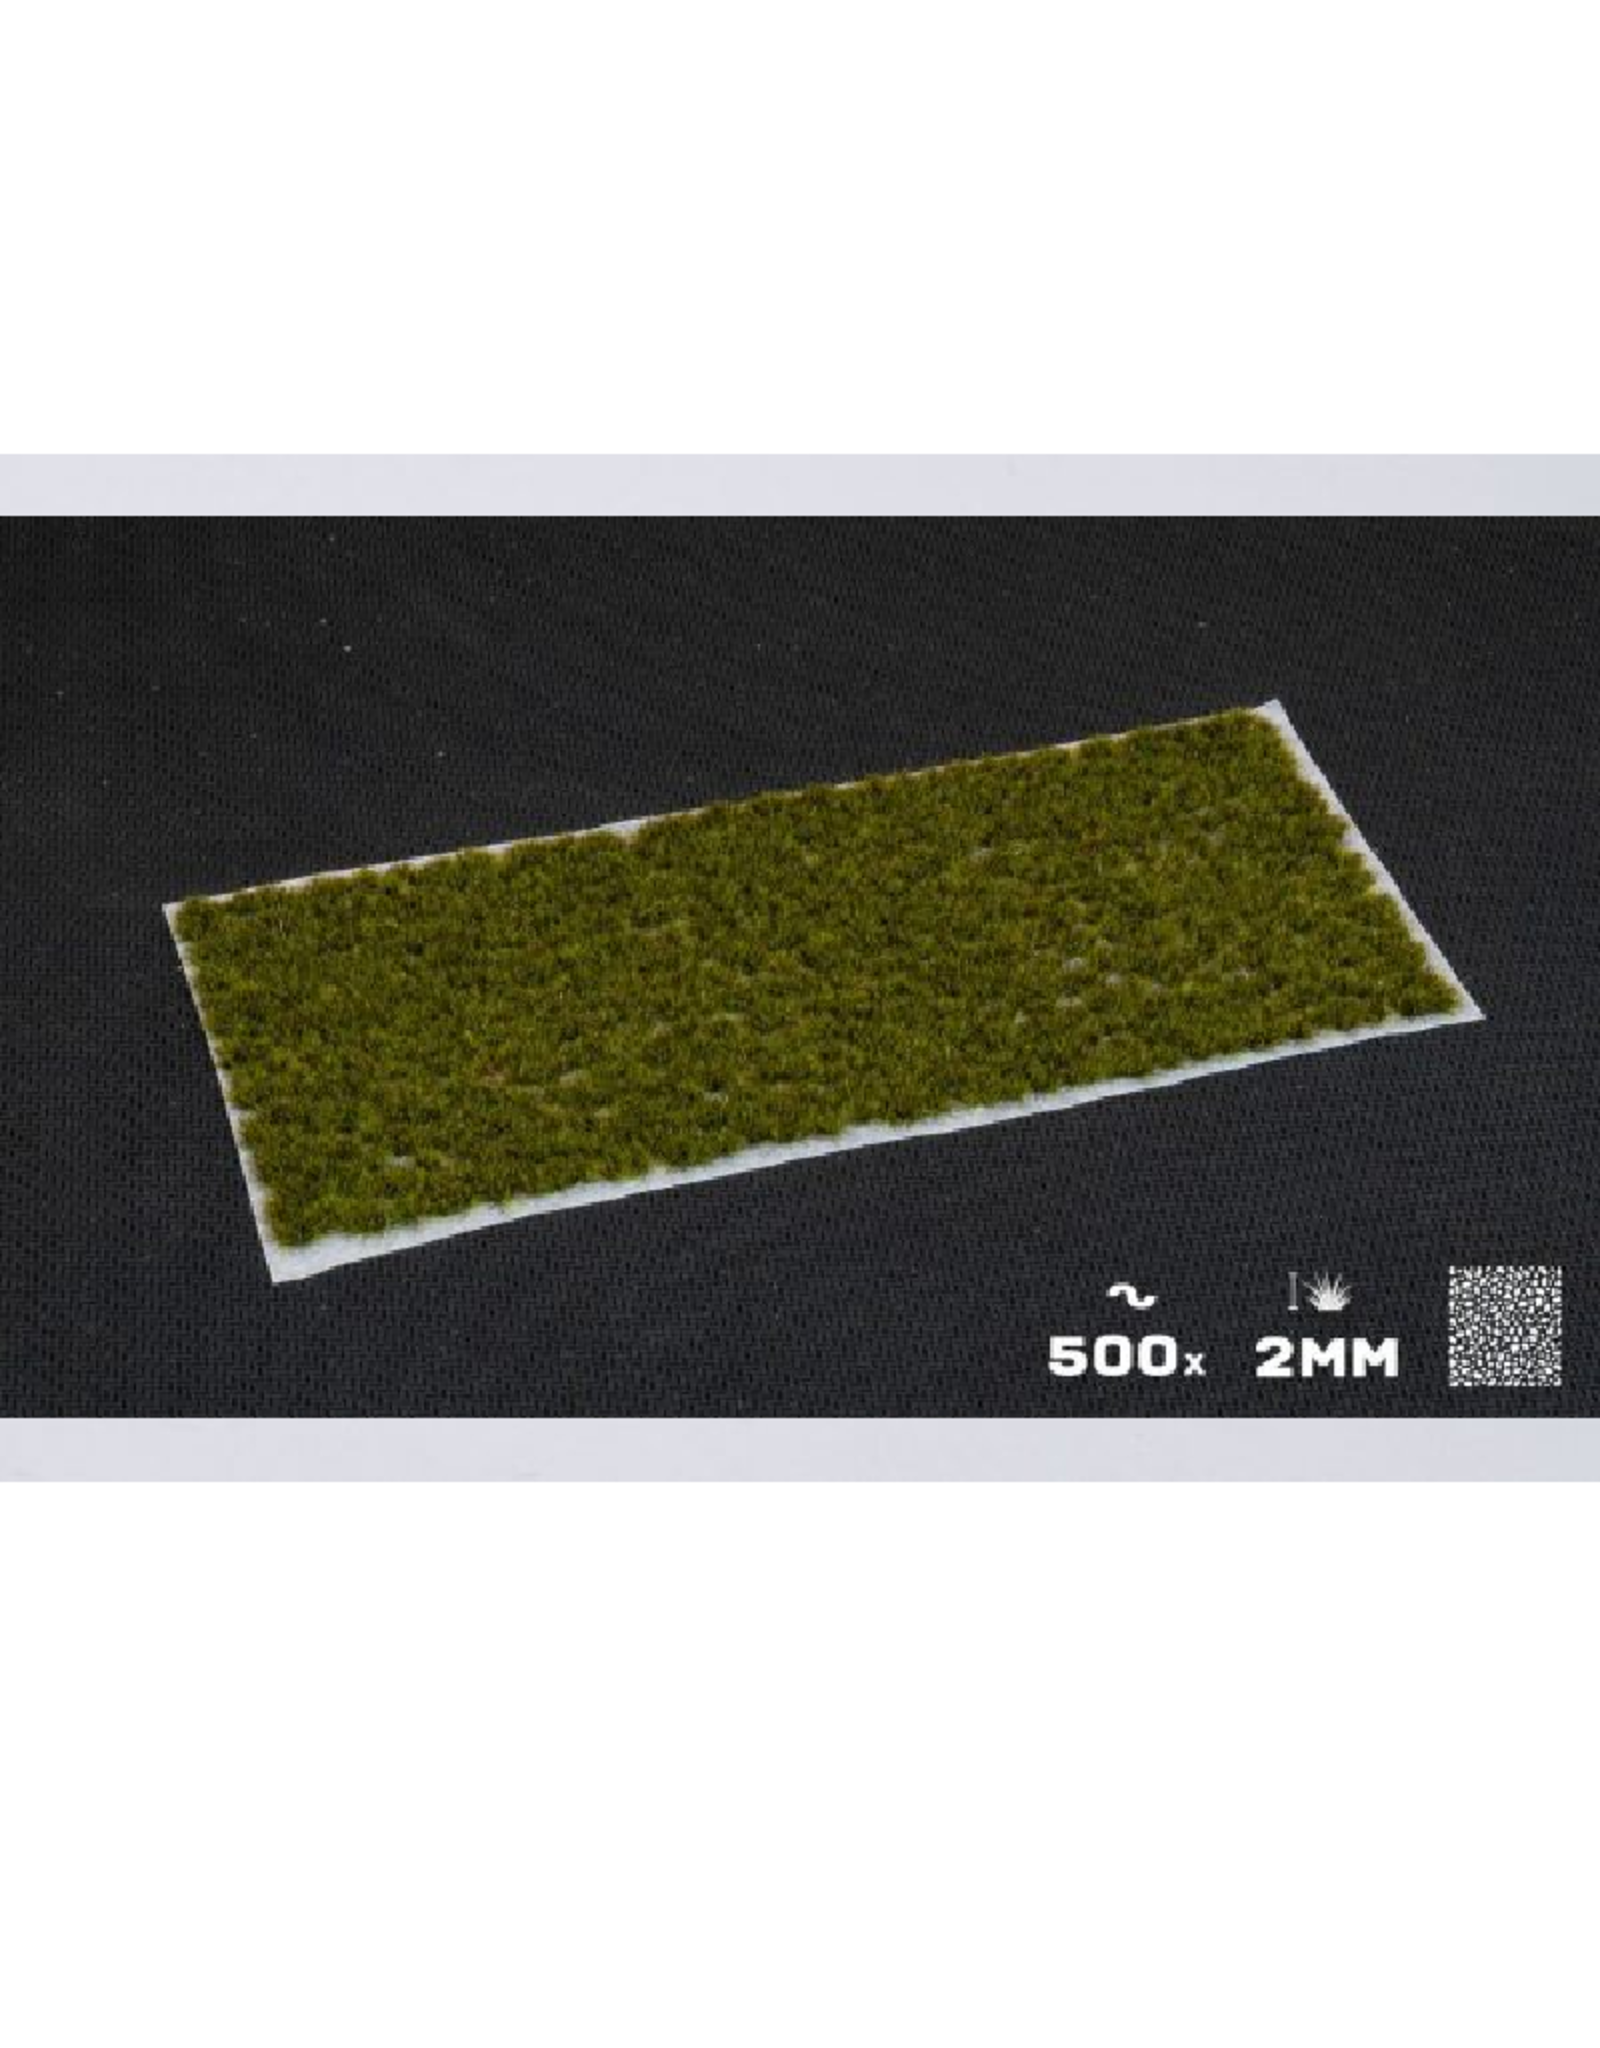 Gamers' Grass Tiny Dark Moss (2mm)